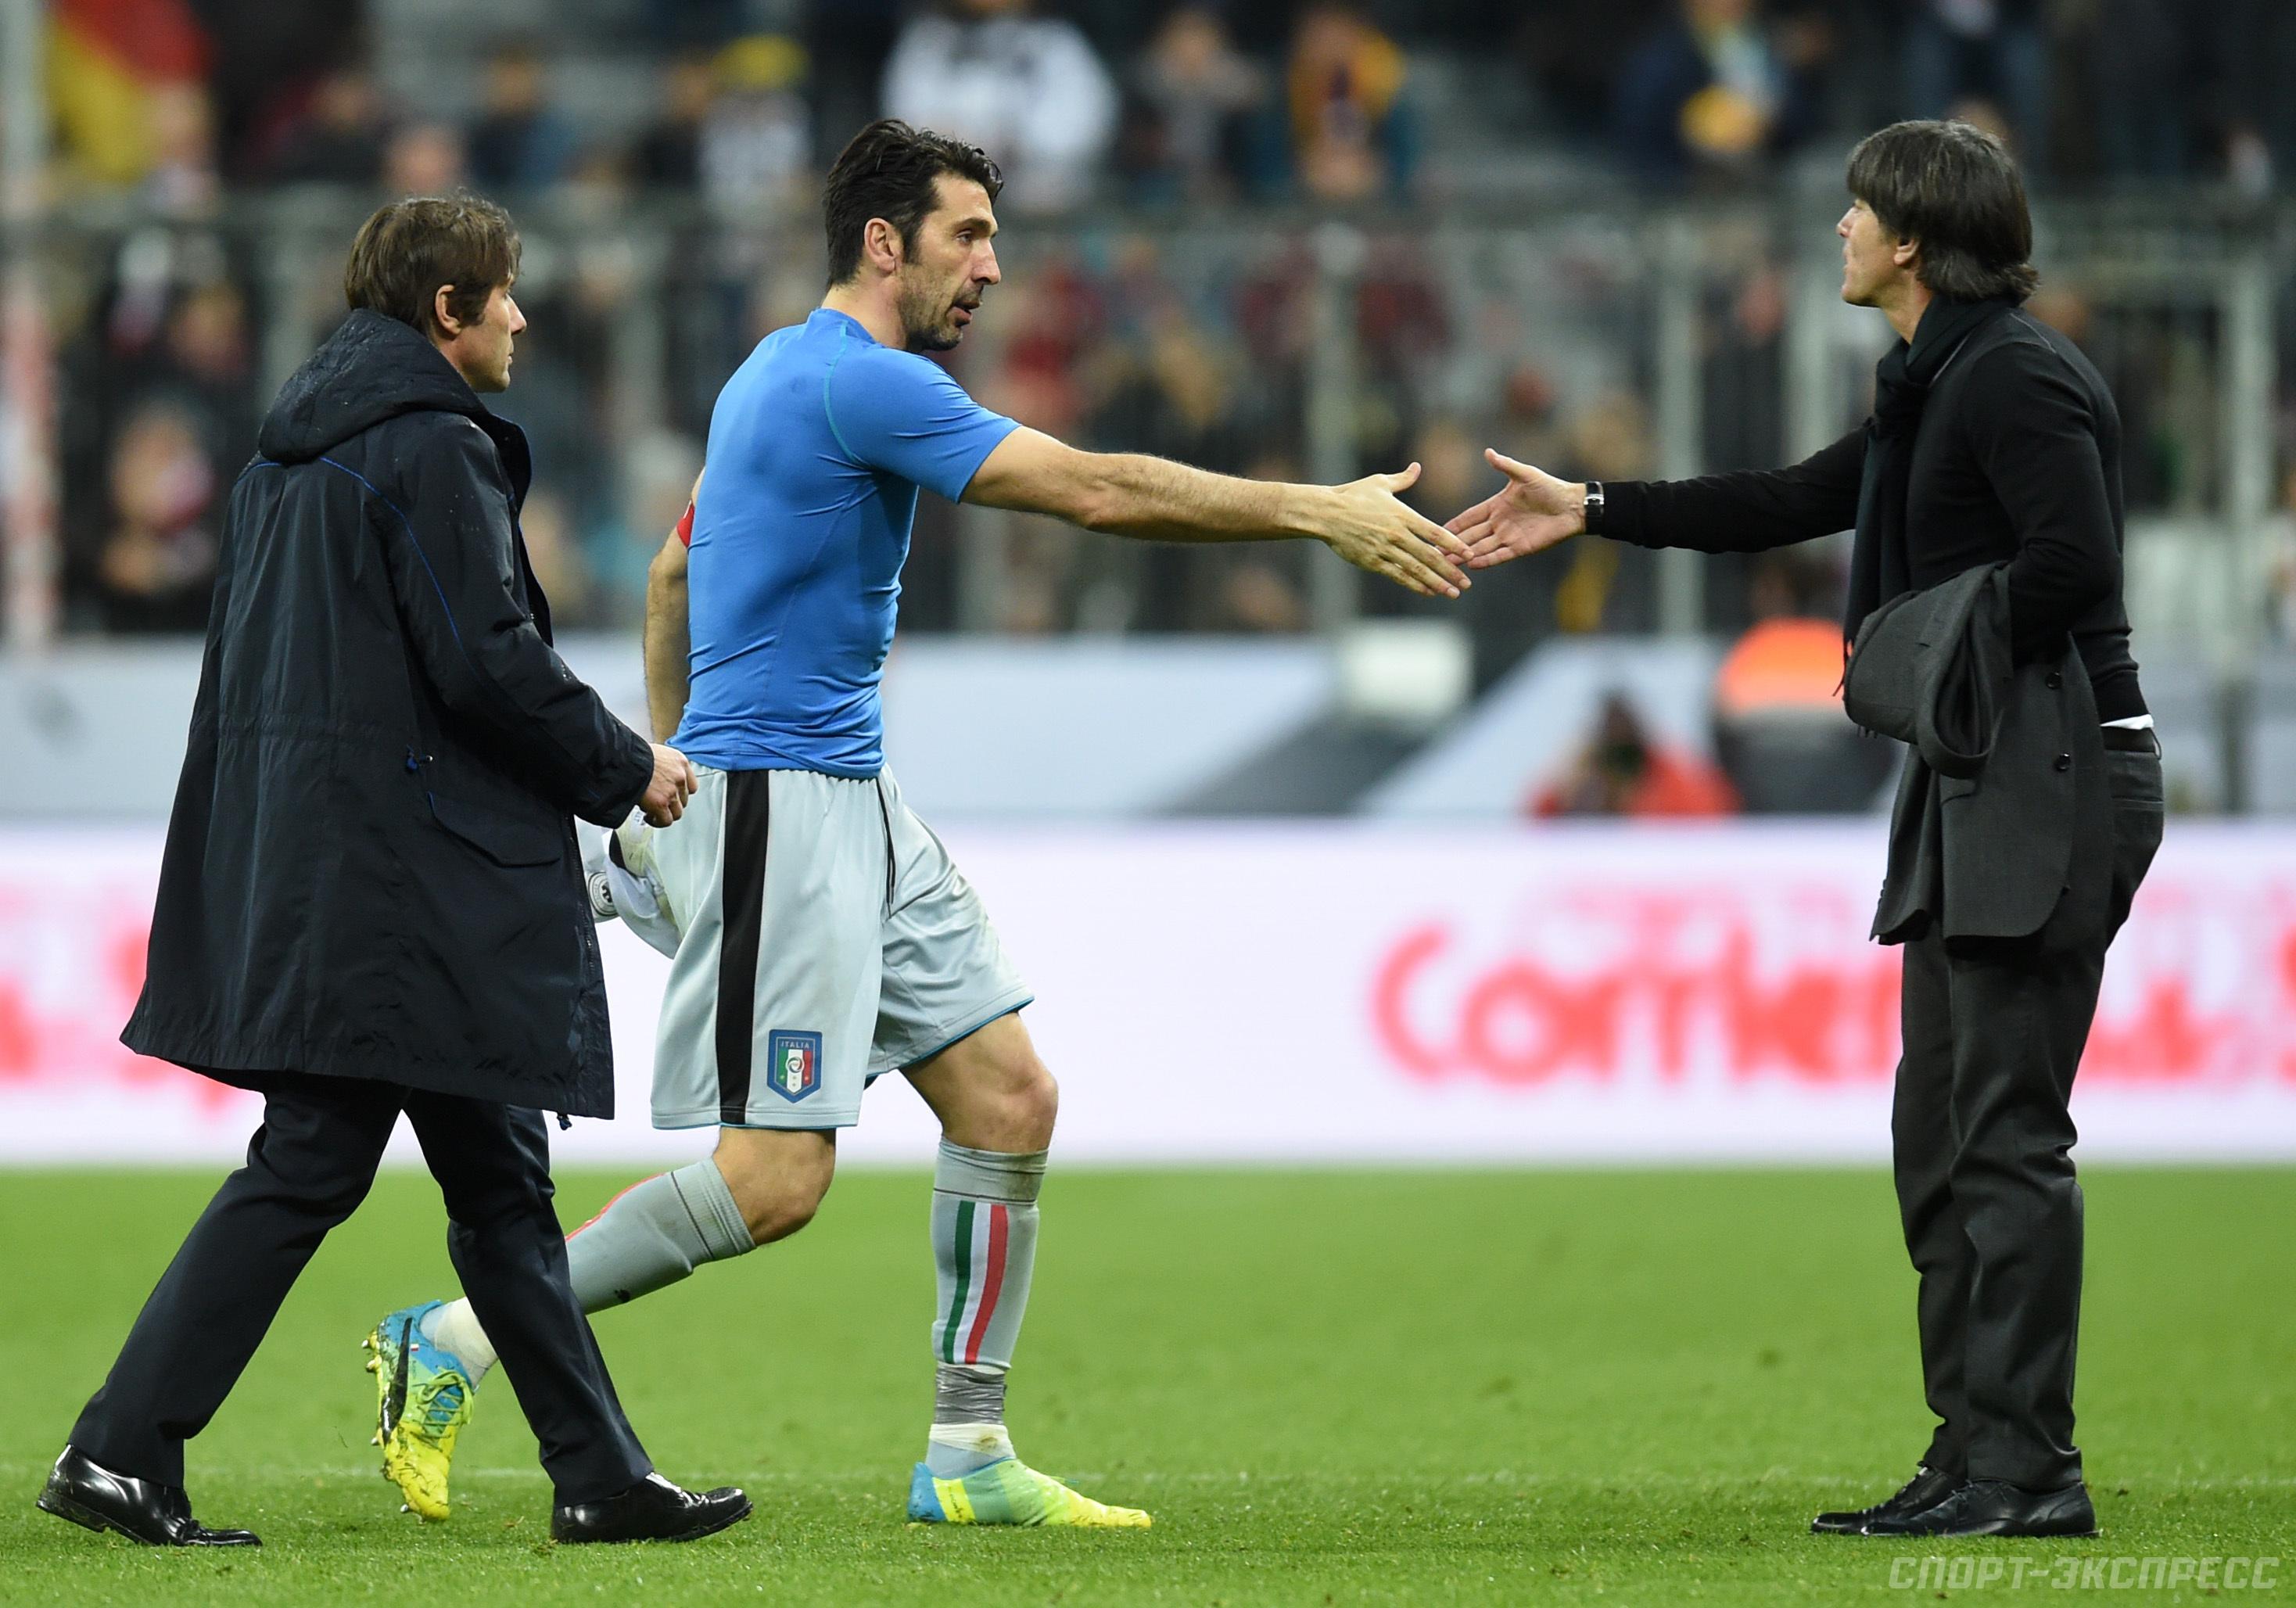 Италия – Германия прогноз на товарищескую встречу